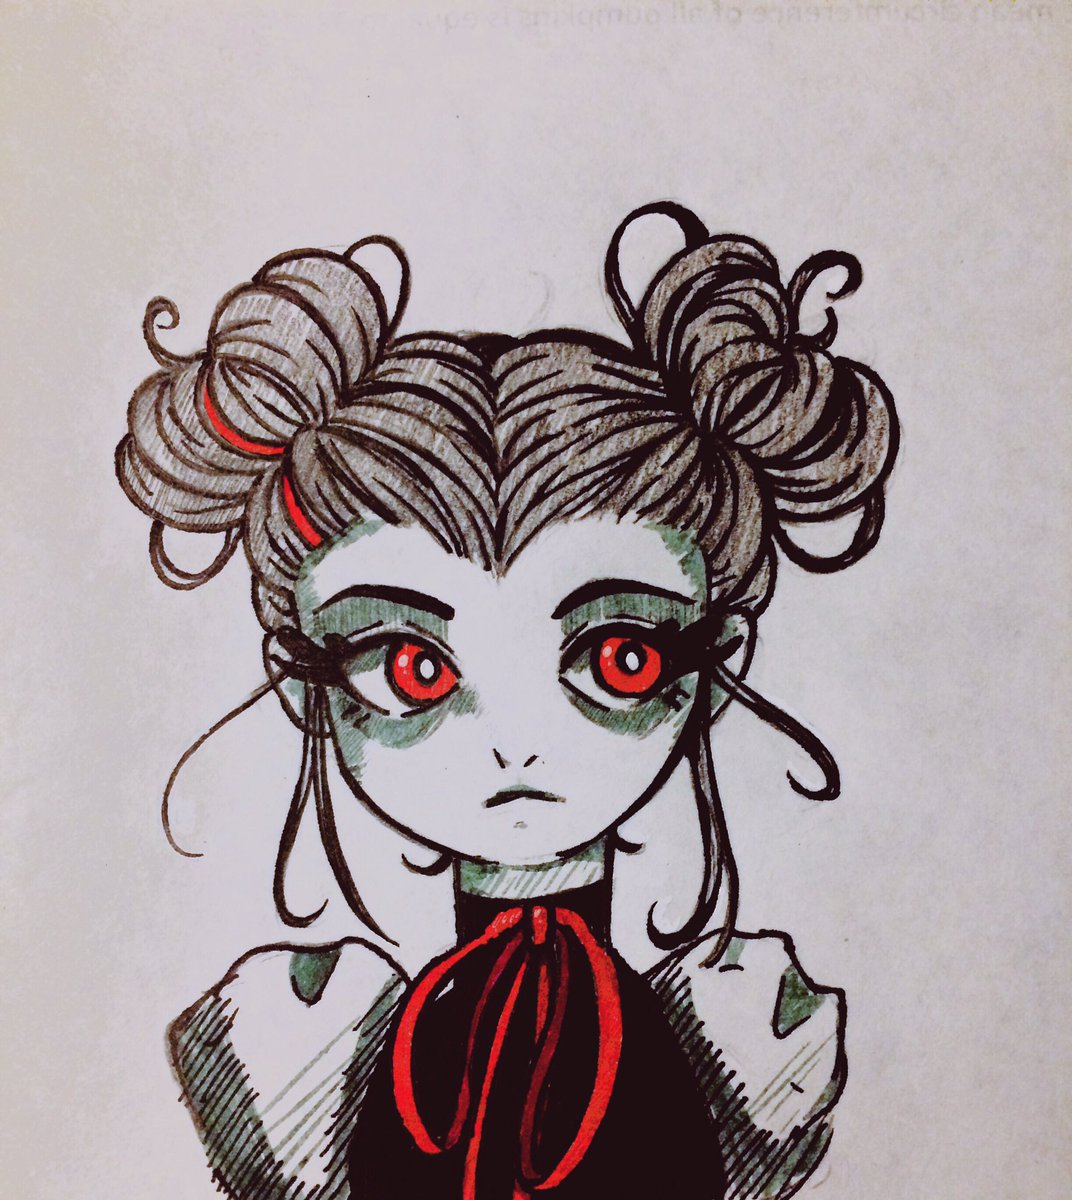 #myart #myartwork #drawing #doodle #ink #anime #animeart #ink https://t.co/uj3RlZCVa8